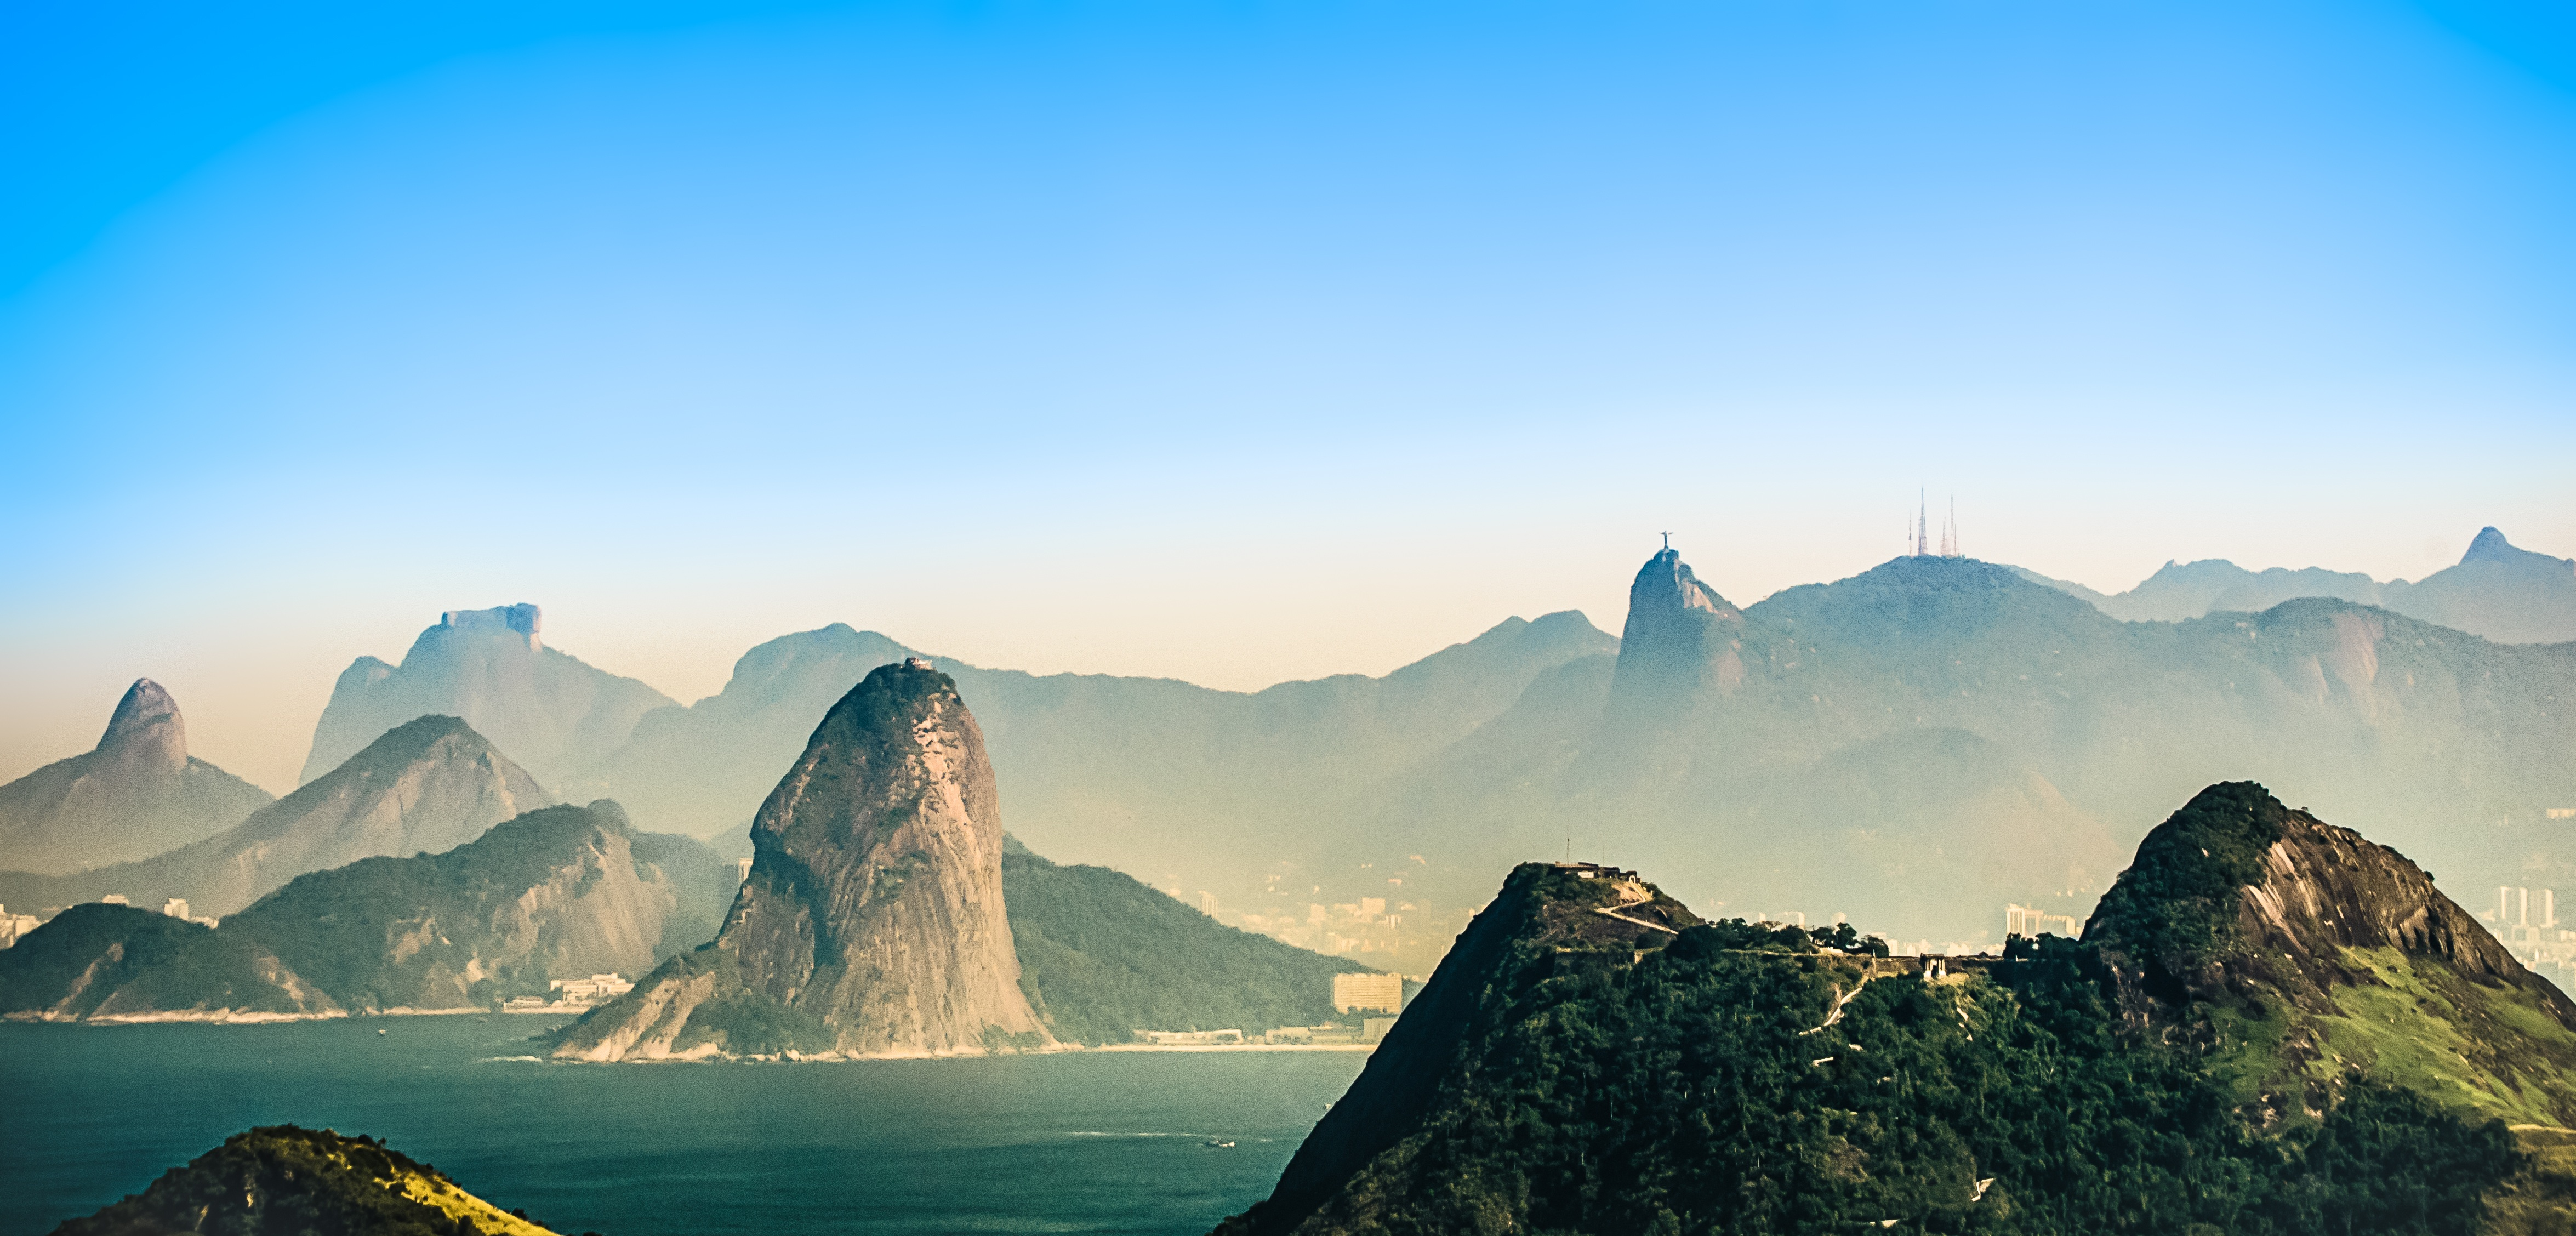 Itaperuna - Rio de Janeiro